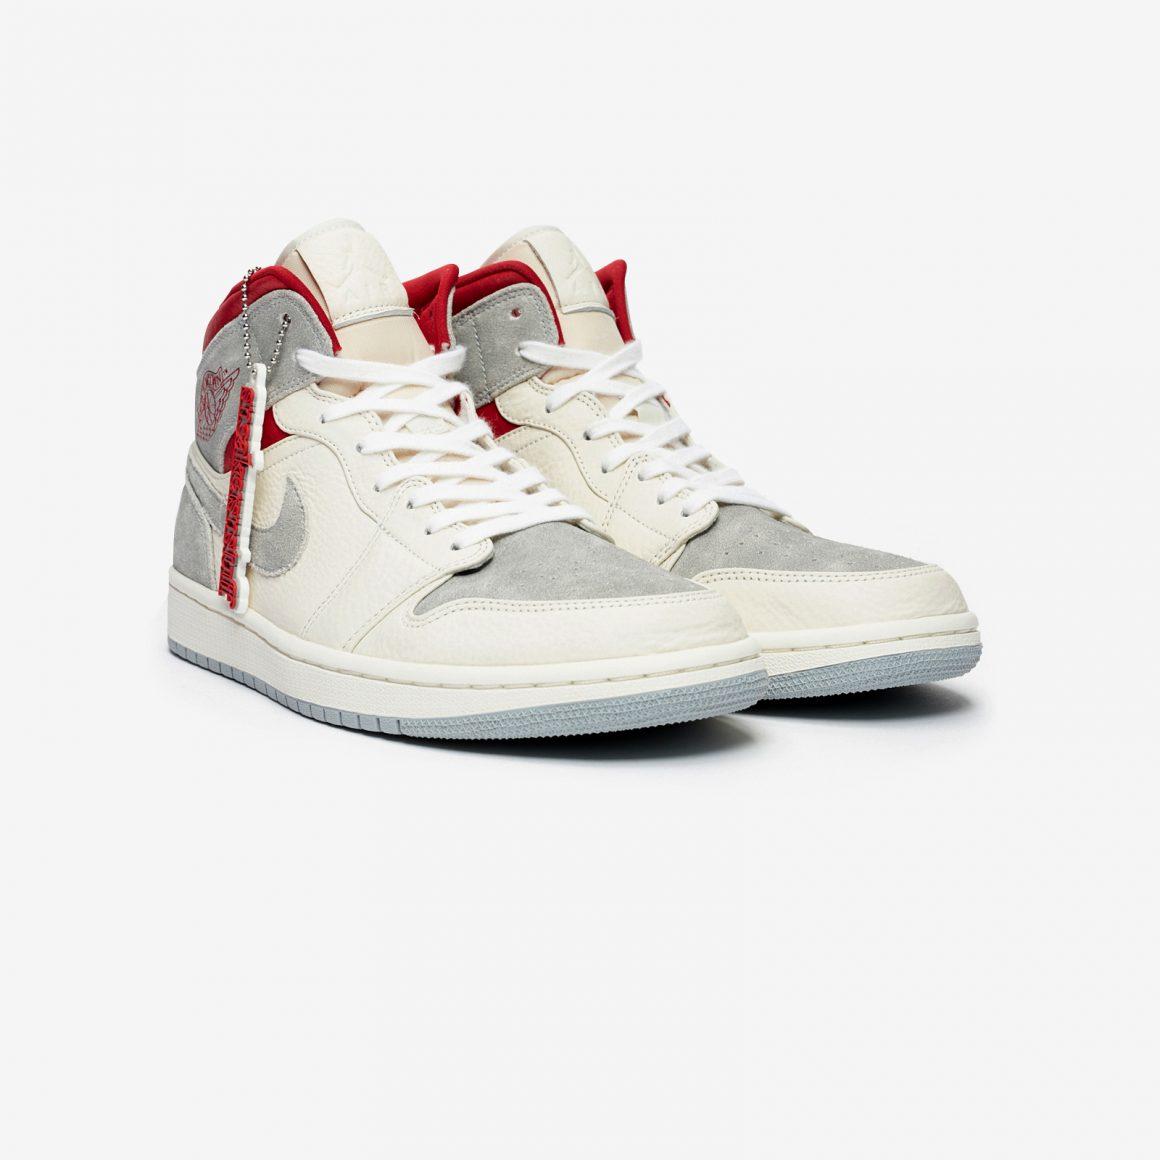 Sneakersnstuff x Air Jordan 1 Mid Premium ''20th Anniversary''